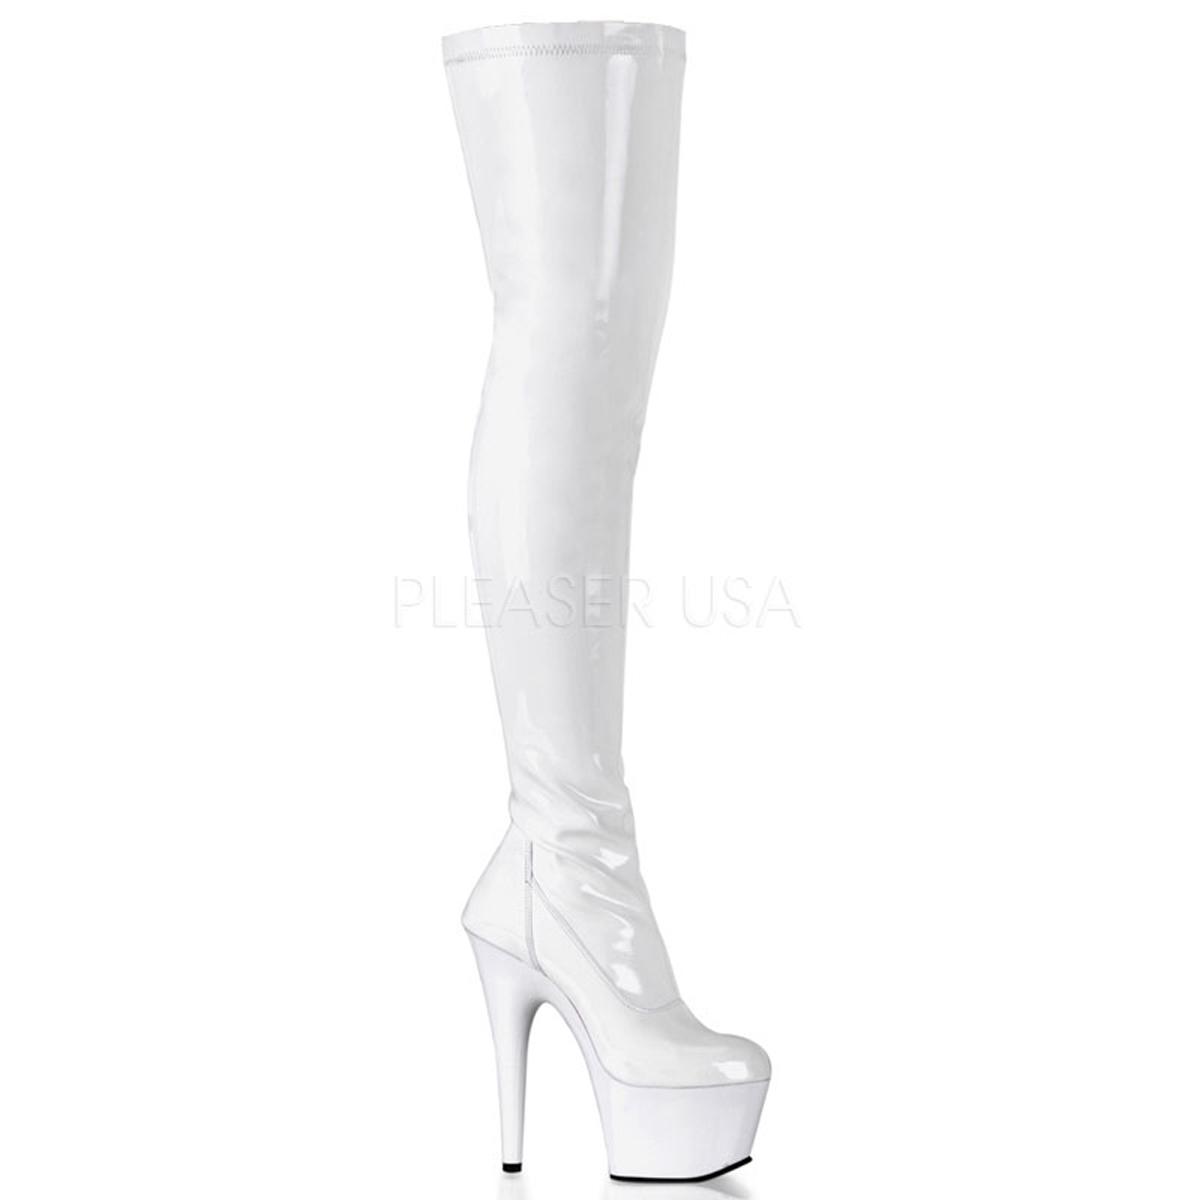 Side Zipper Black;6 pleaser Womens 5 Inch Plain Stretch Knee Boot